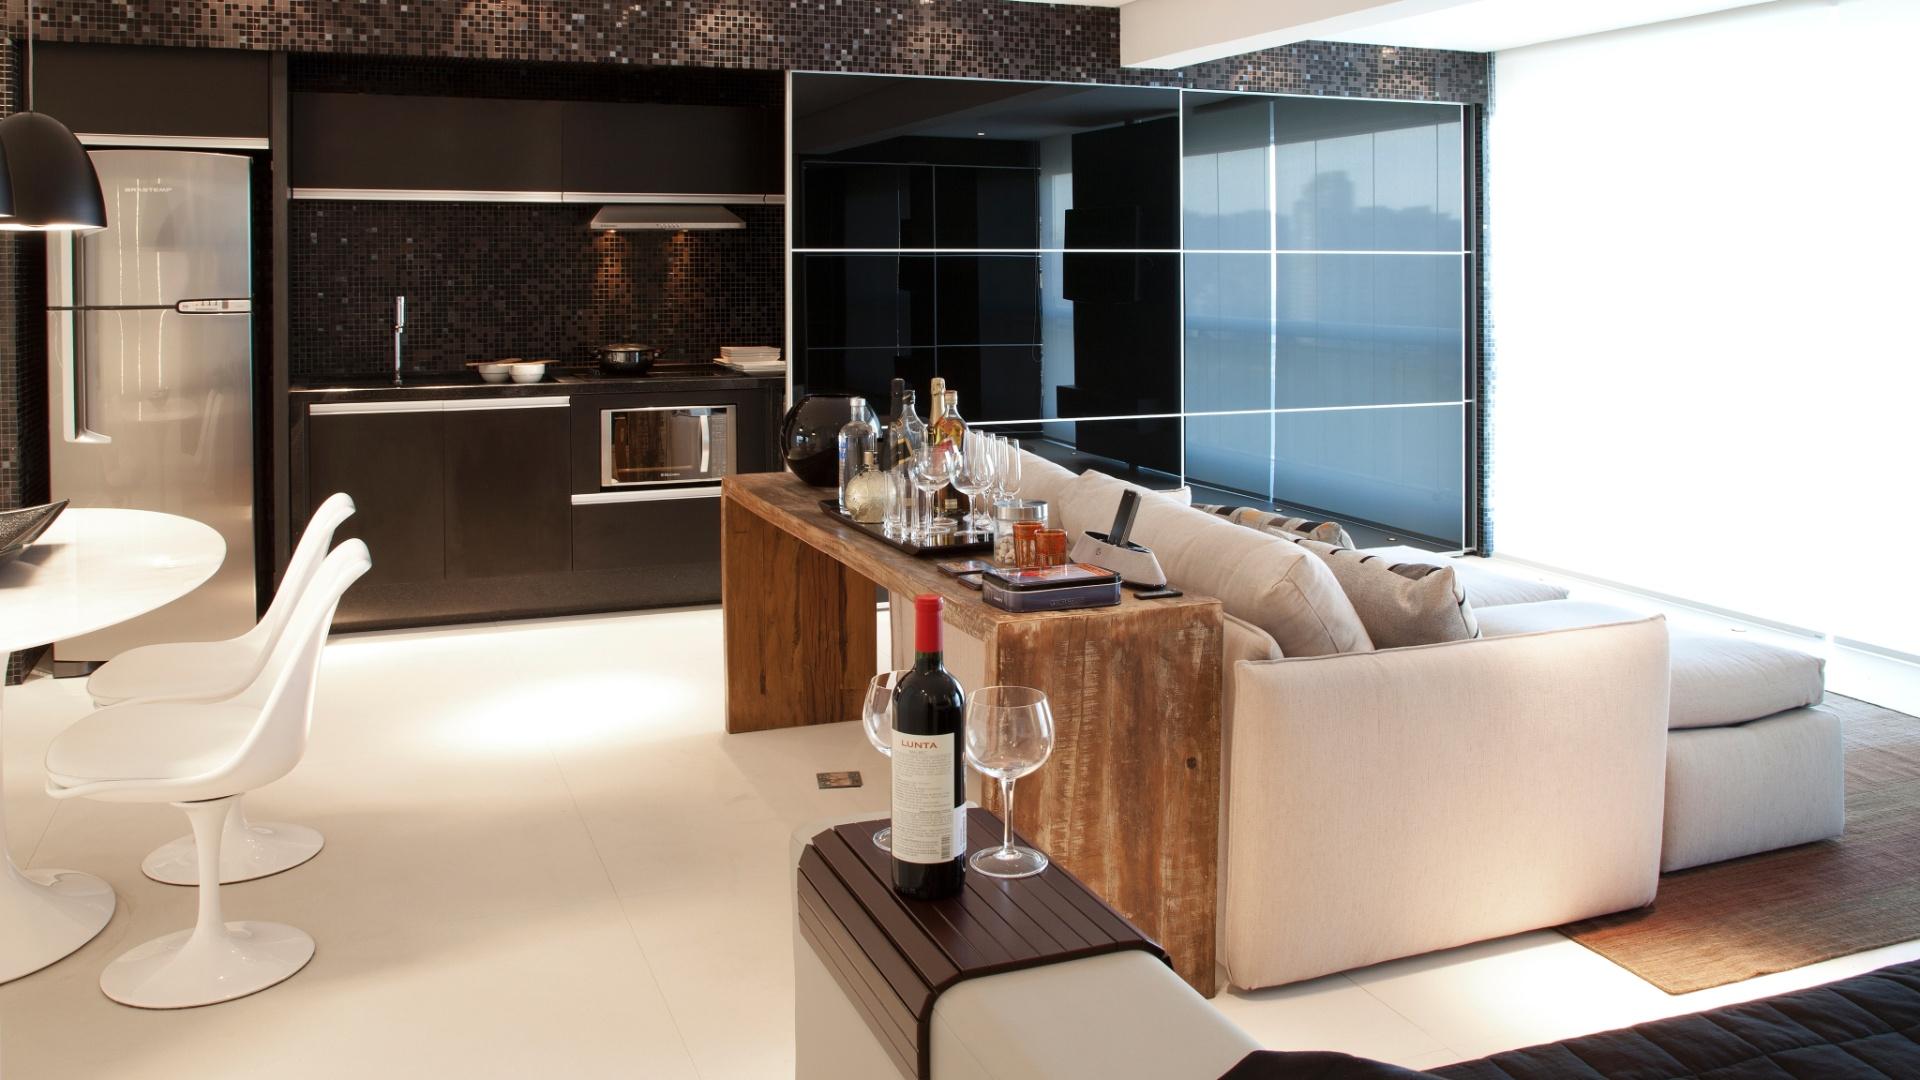 .ninja/decoracao/decoracao de sala integrada cozinha 12 quotes.html #694430 1920 1080